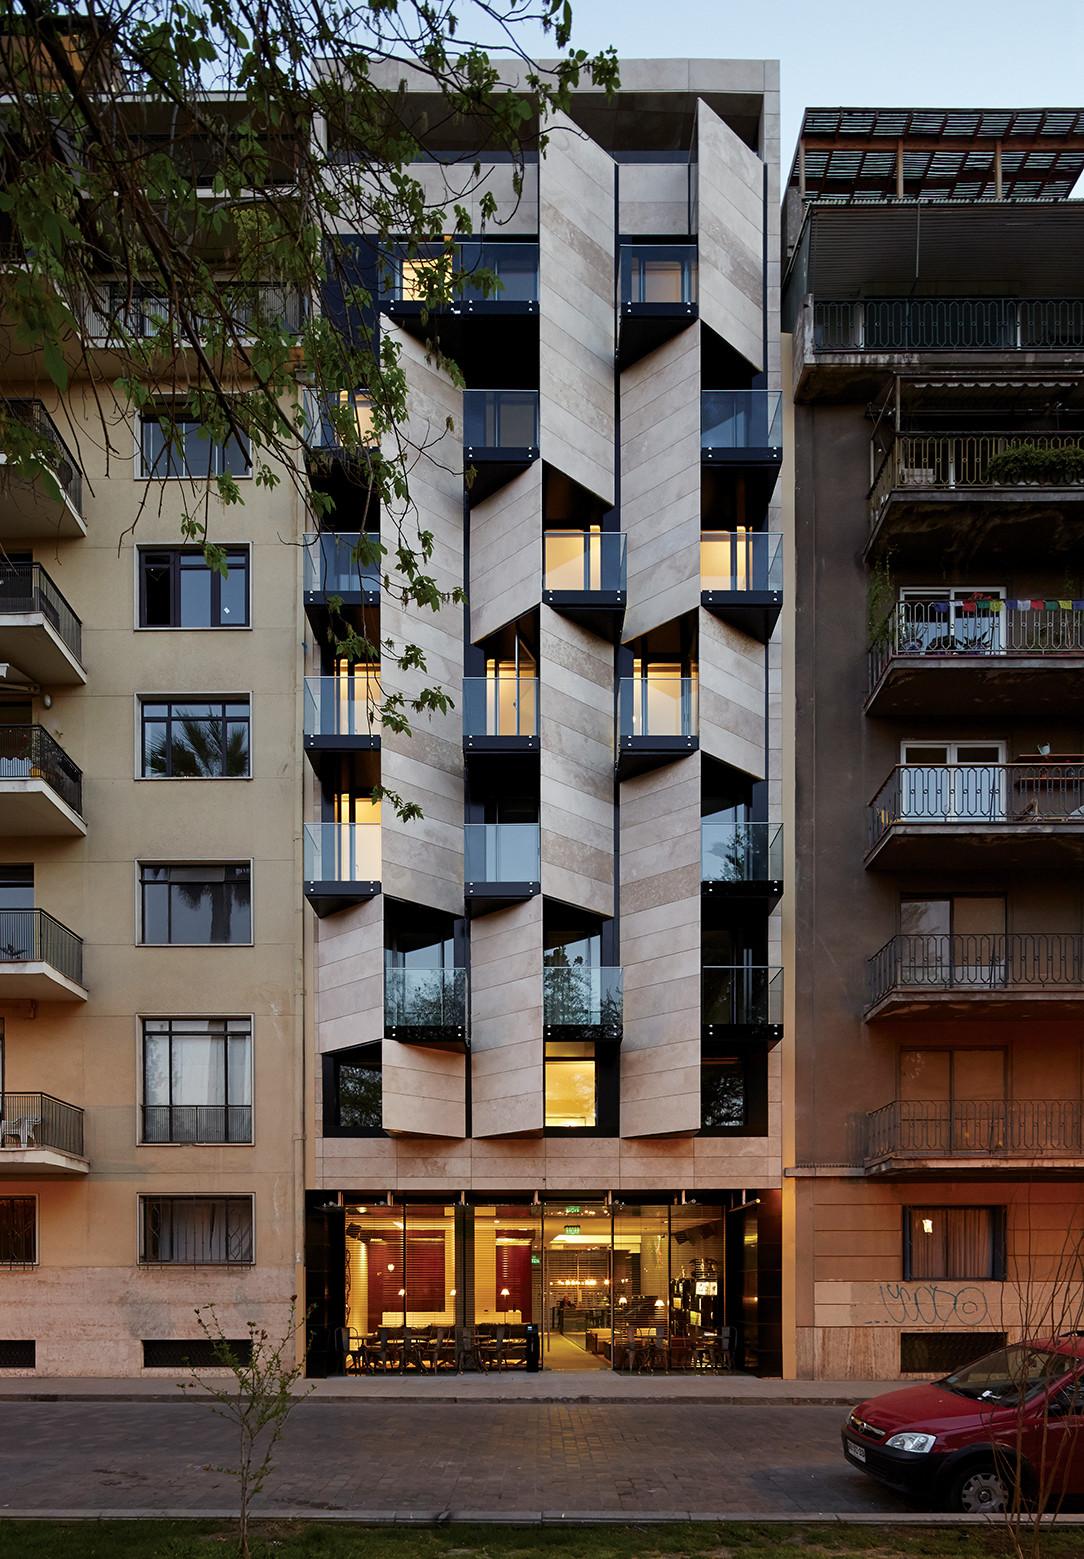 Galer a de apart hotel ismael 312 estudio larrain 6 for Hotel design facade